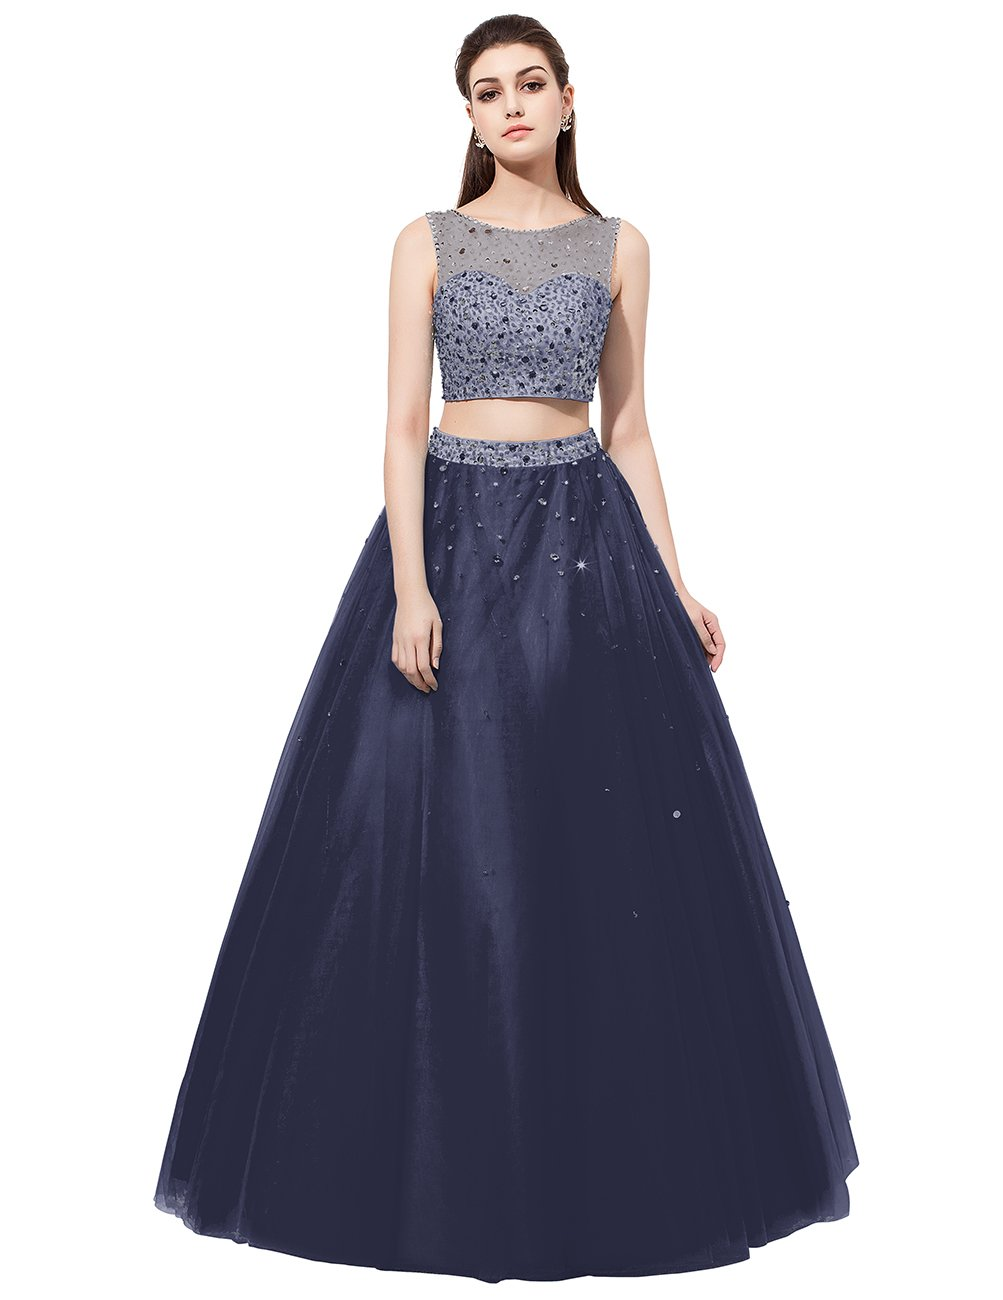 0ddd419cf80cc Dresstell 演奏会ドレス ステージドレス ビジュー付き ツーピースドレス 袖なし ビスチェタイプ 発表会